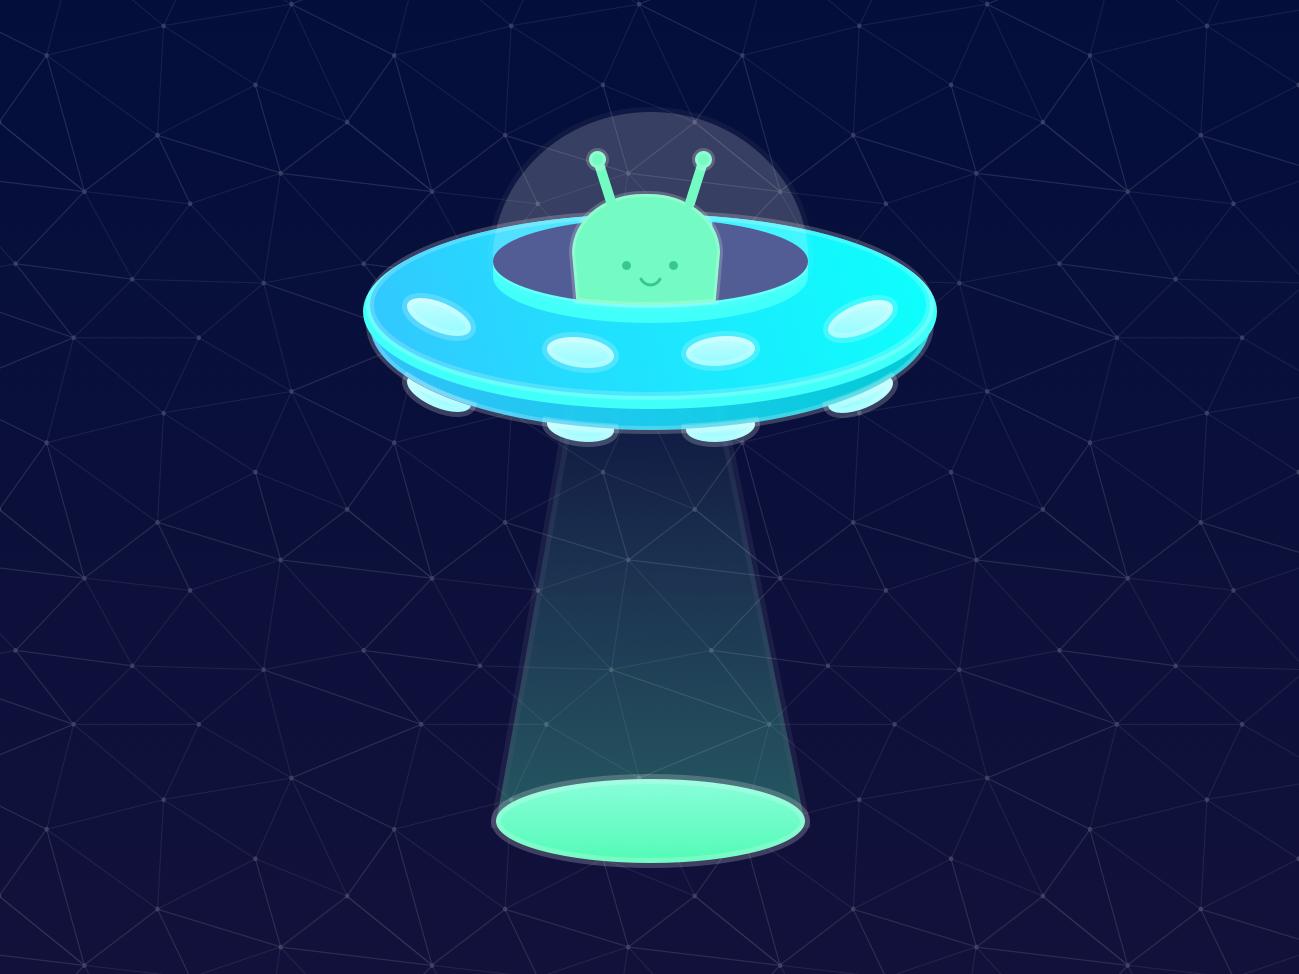 Alien ufo spaceship alien illustration illustrator adobe space stars sky vector galaxy